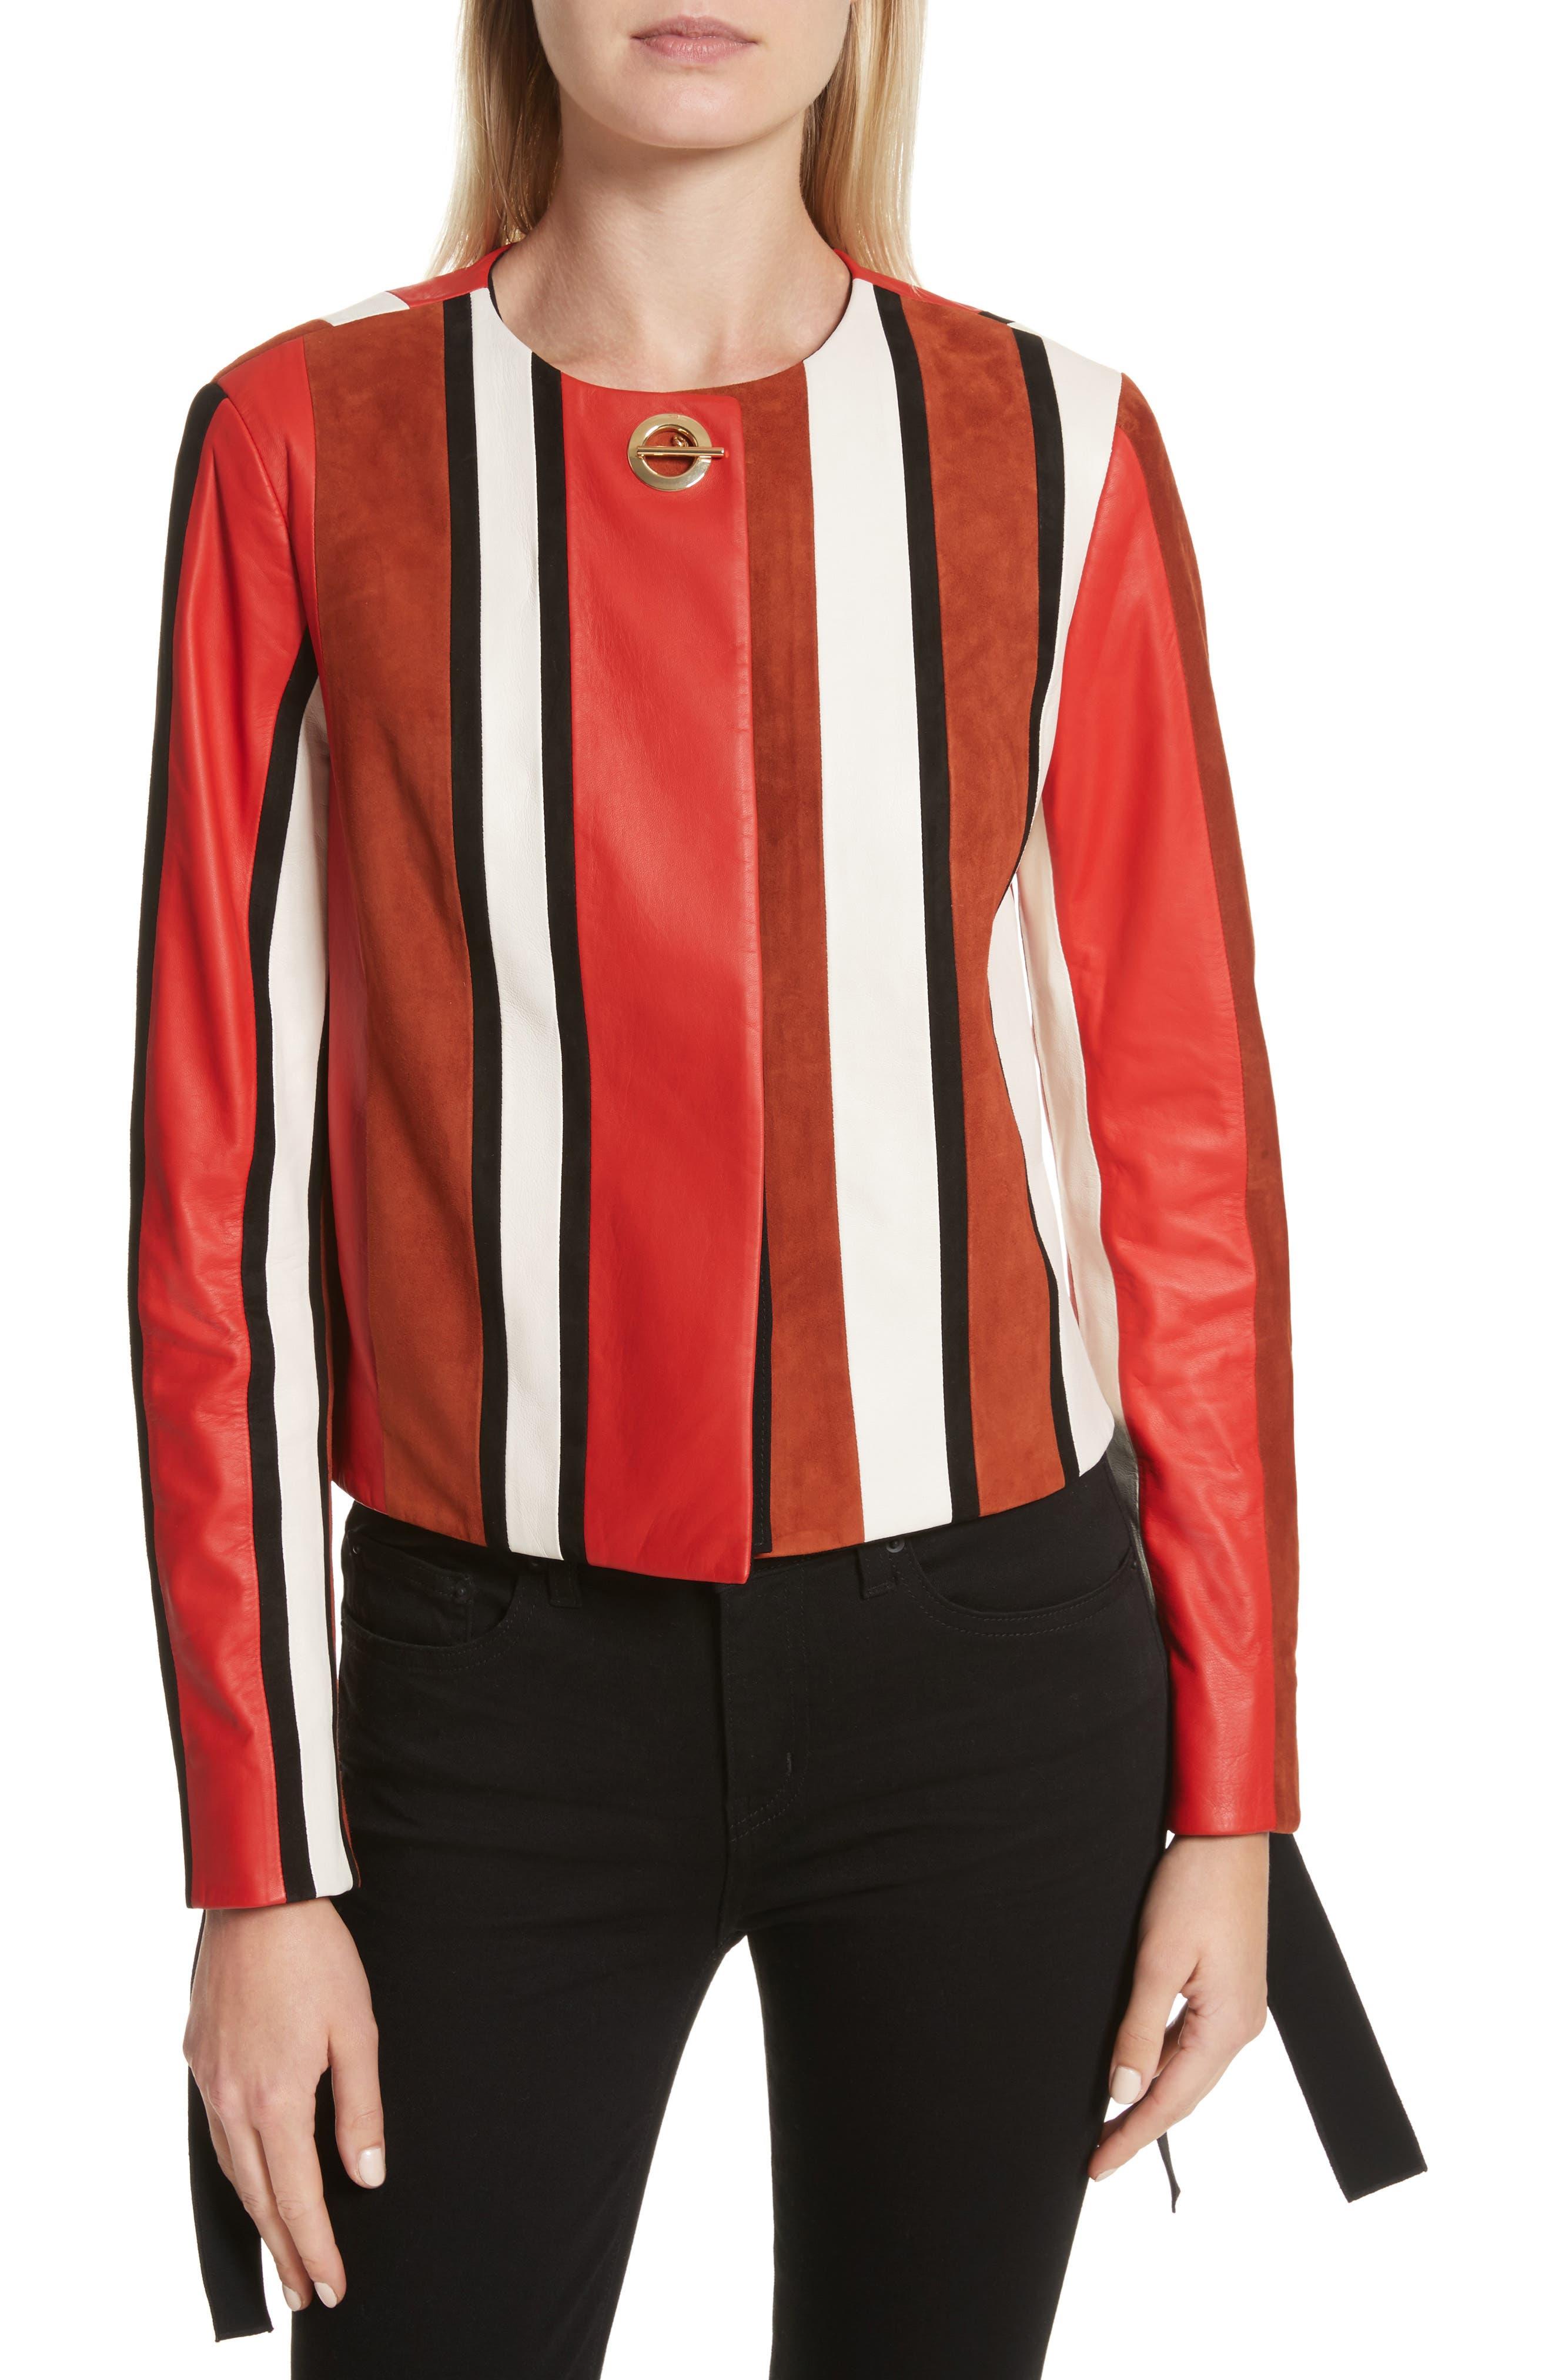 Derek Lam 10 Crosby Stripe Collarless Leather Jacket